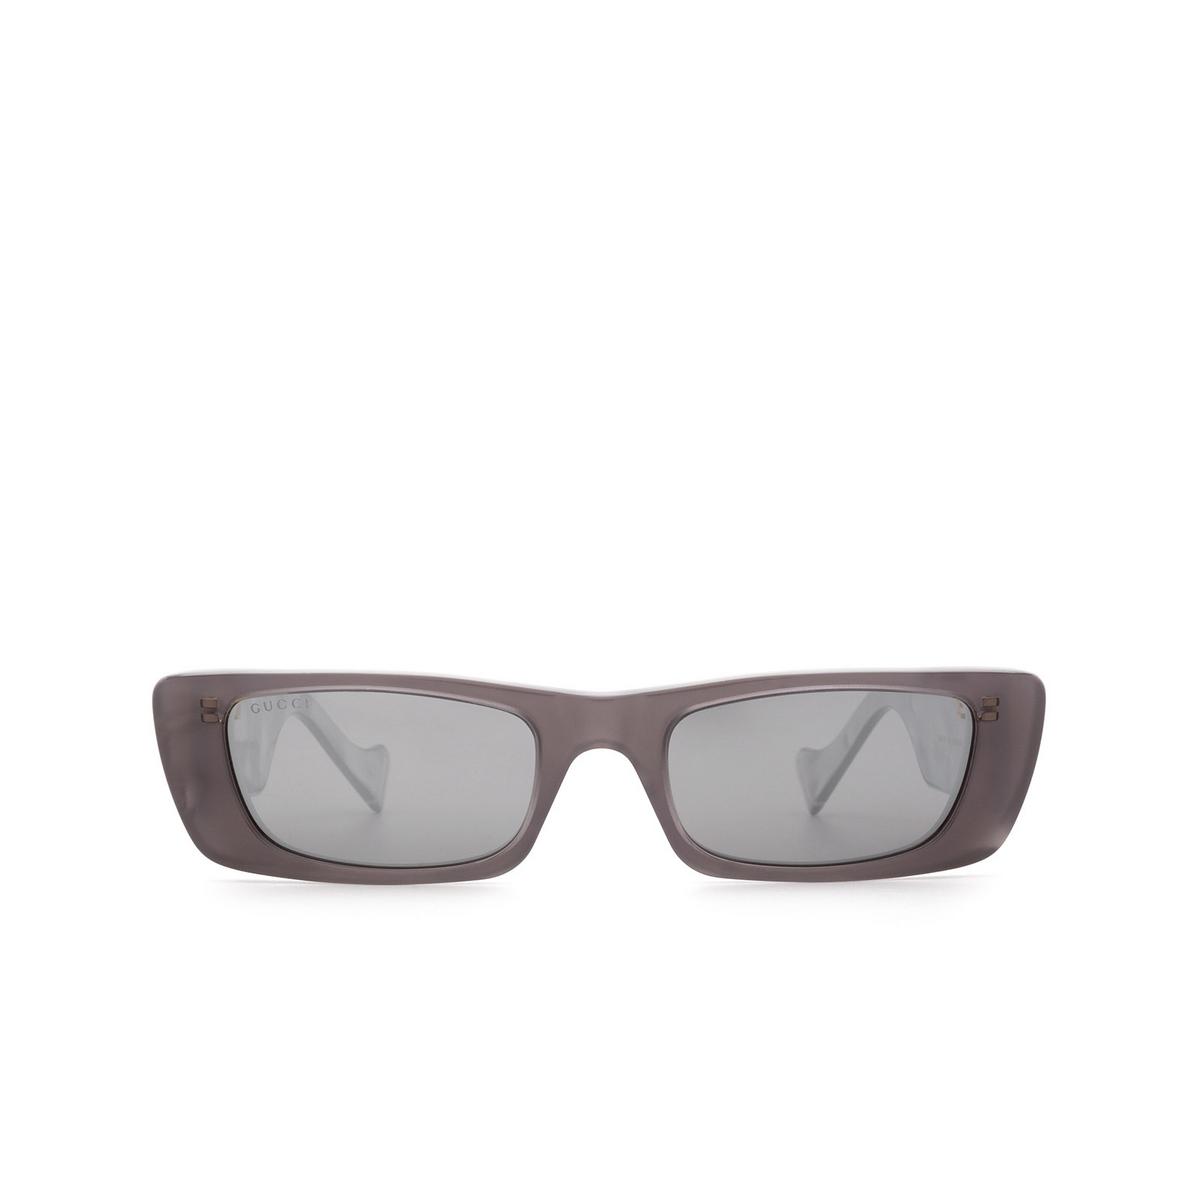 Gucci® Rectangle Sunglasses: GG0516S color Grey 002.